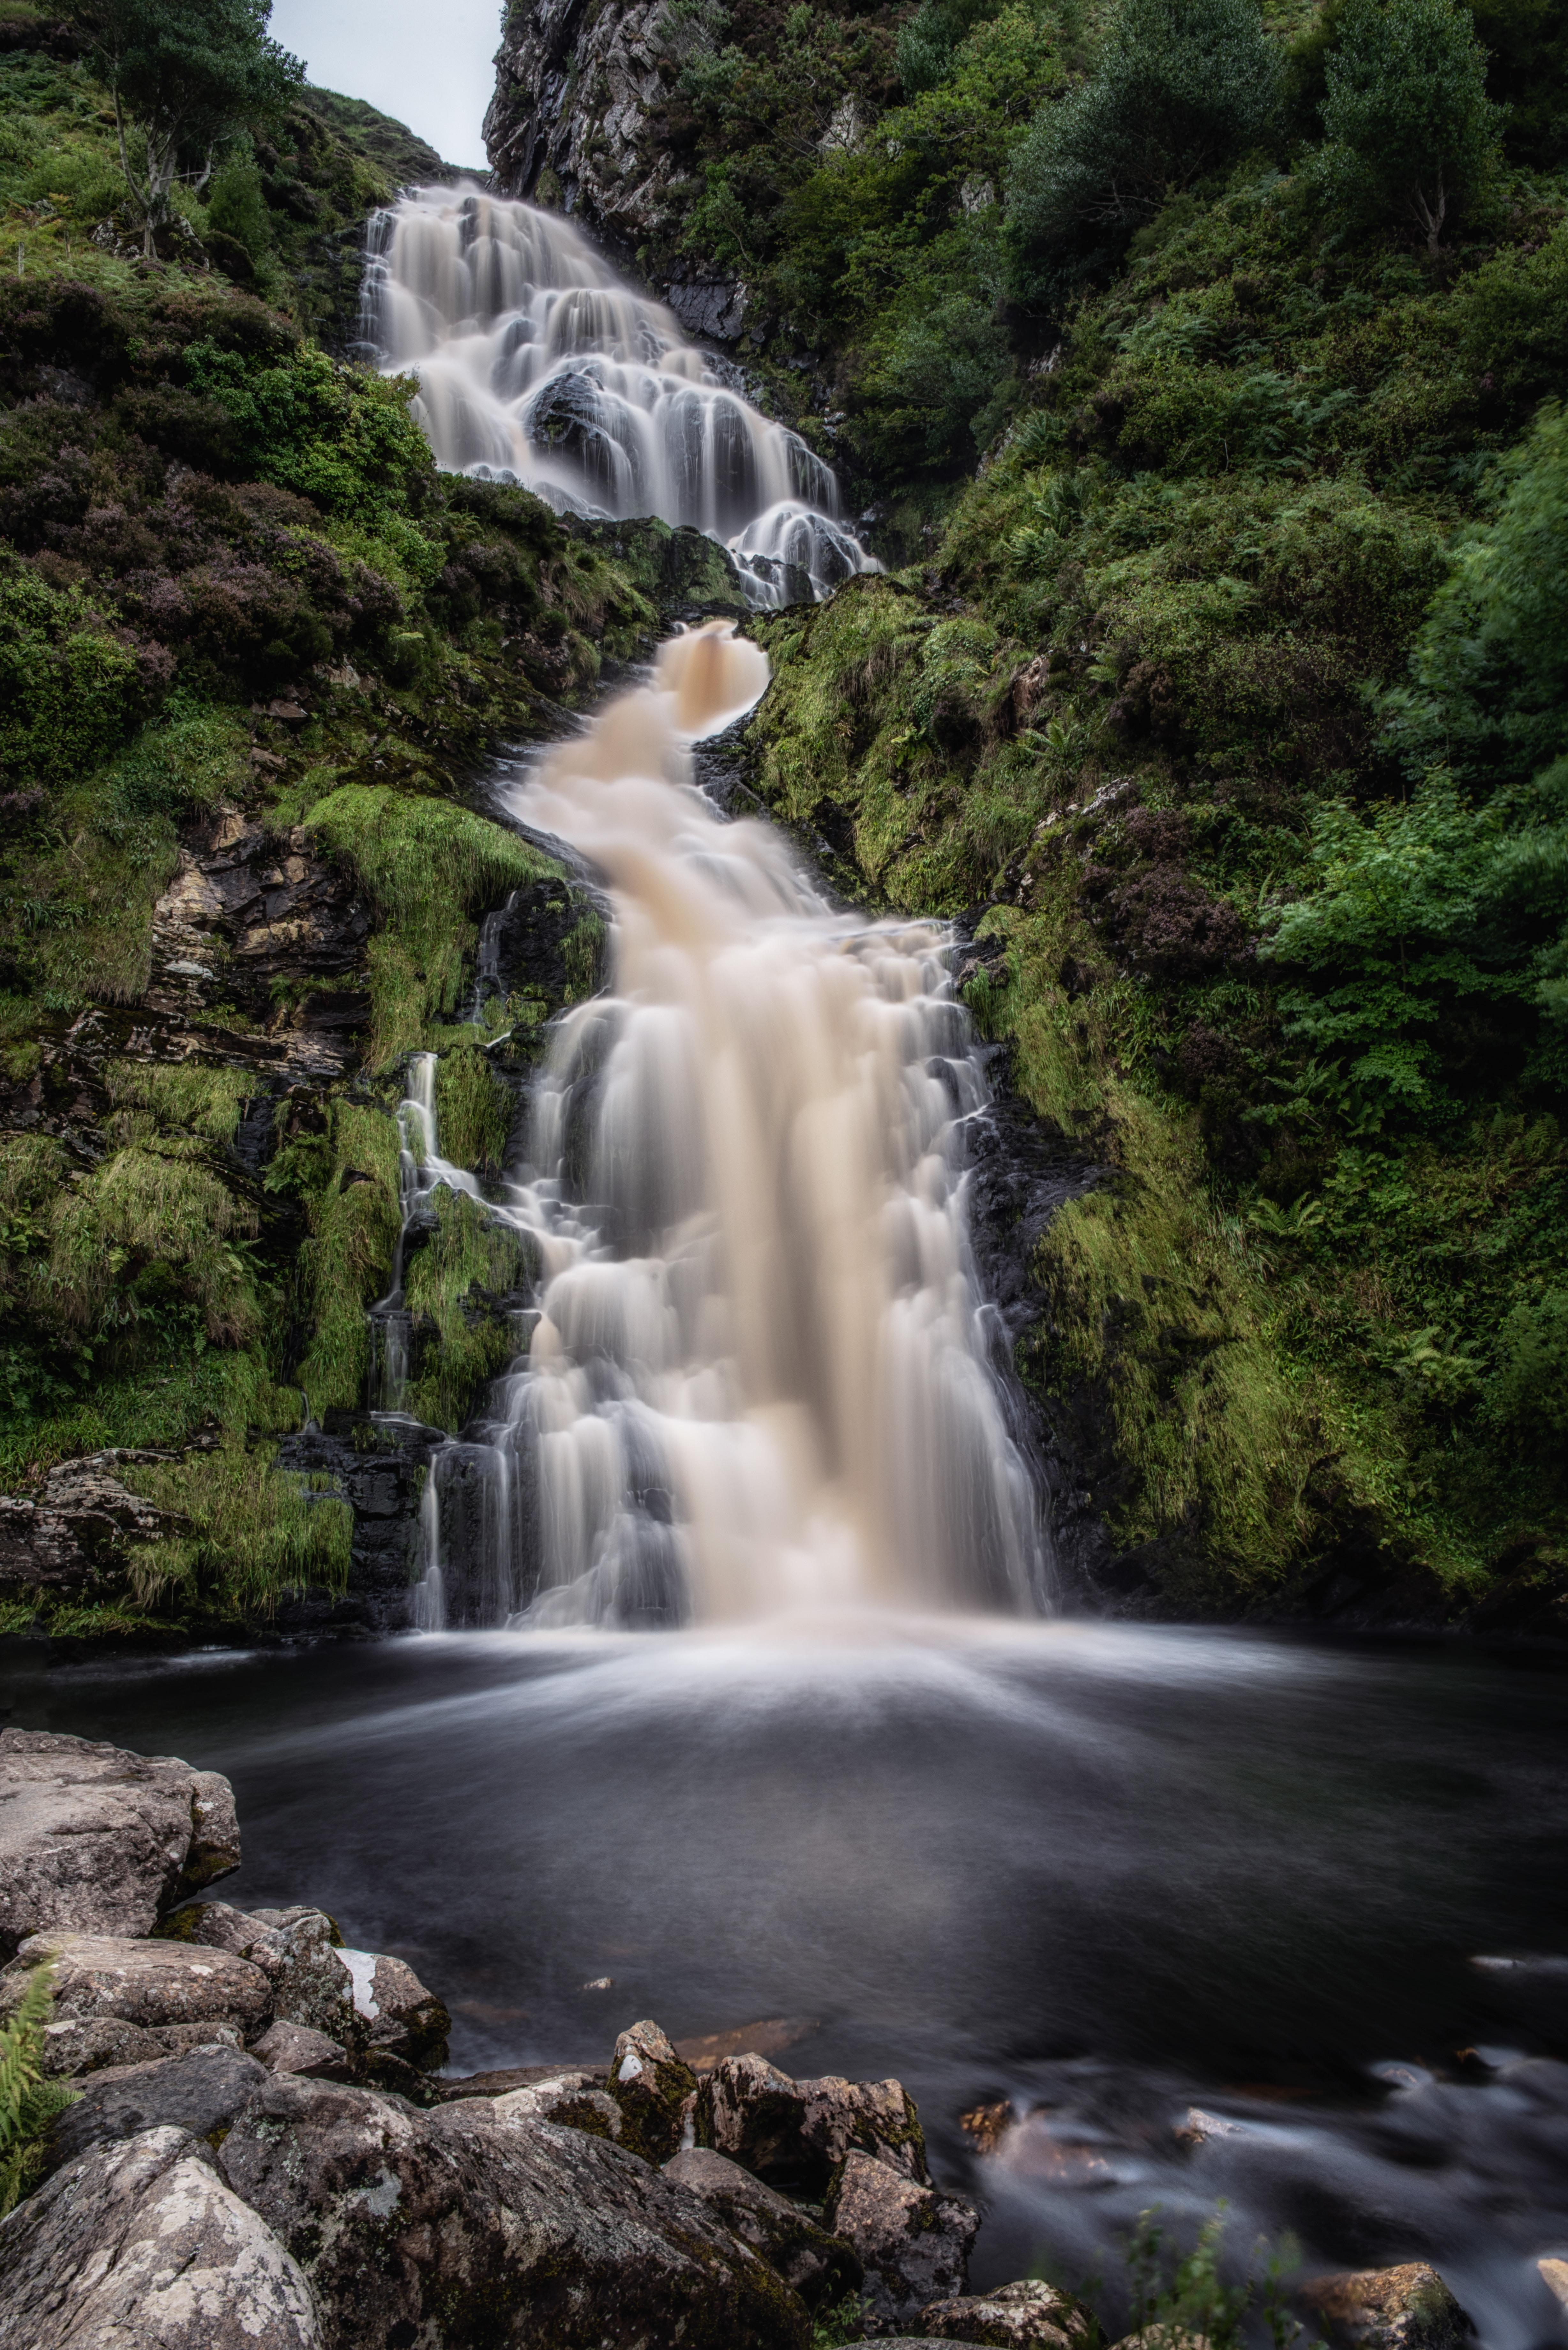 shallow focus photo of waterfalls